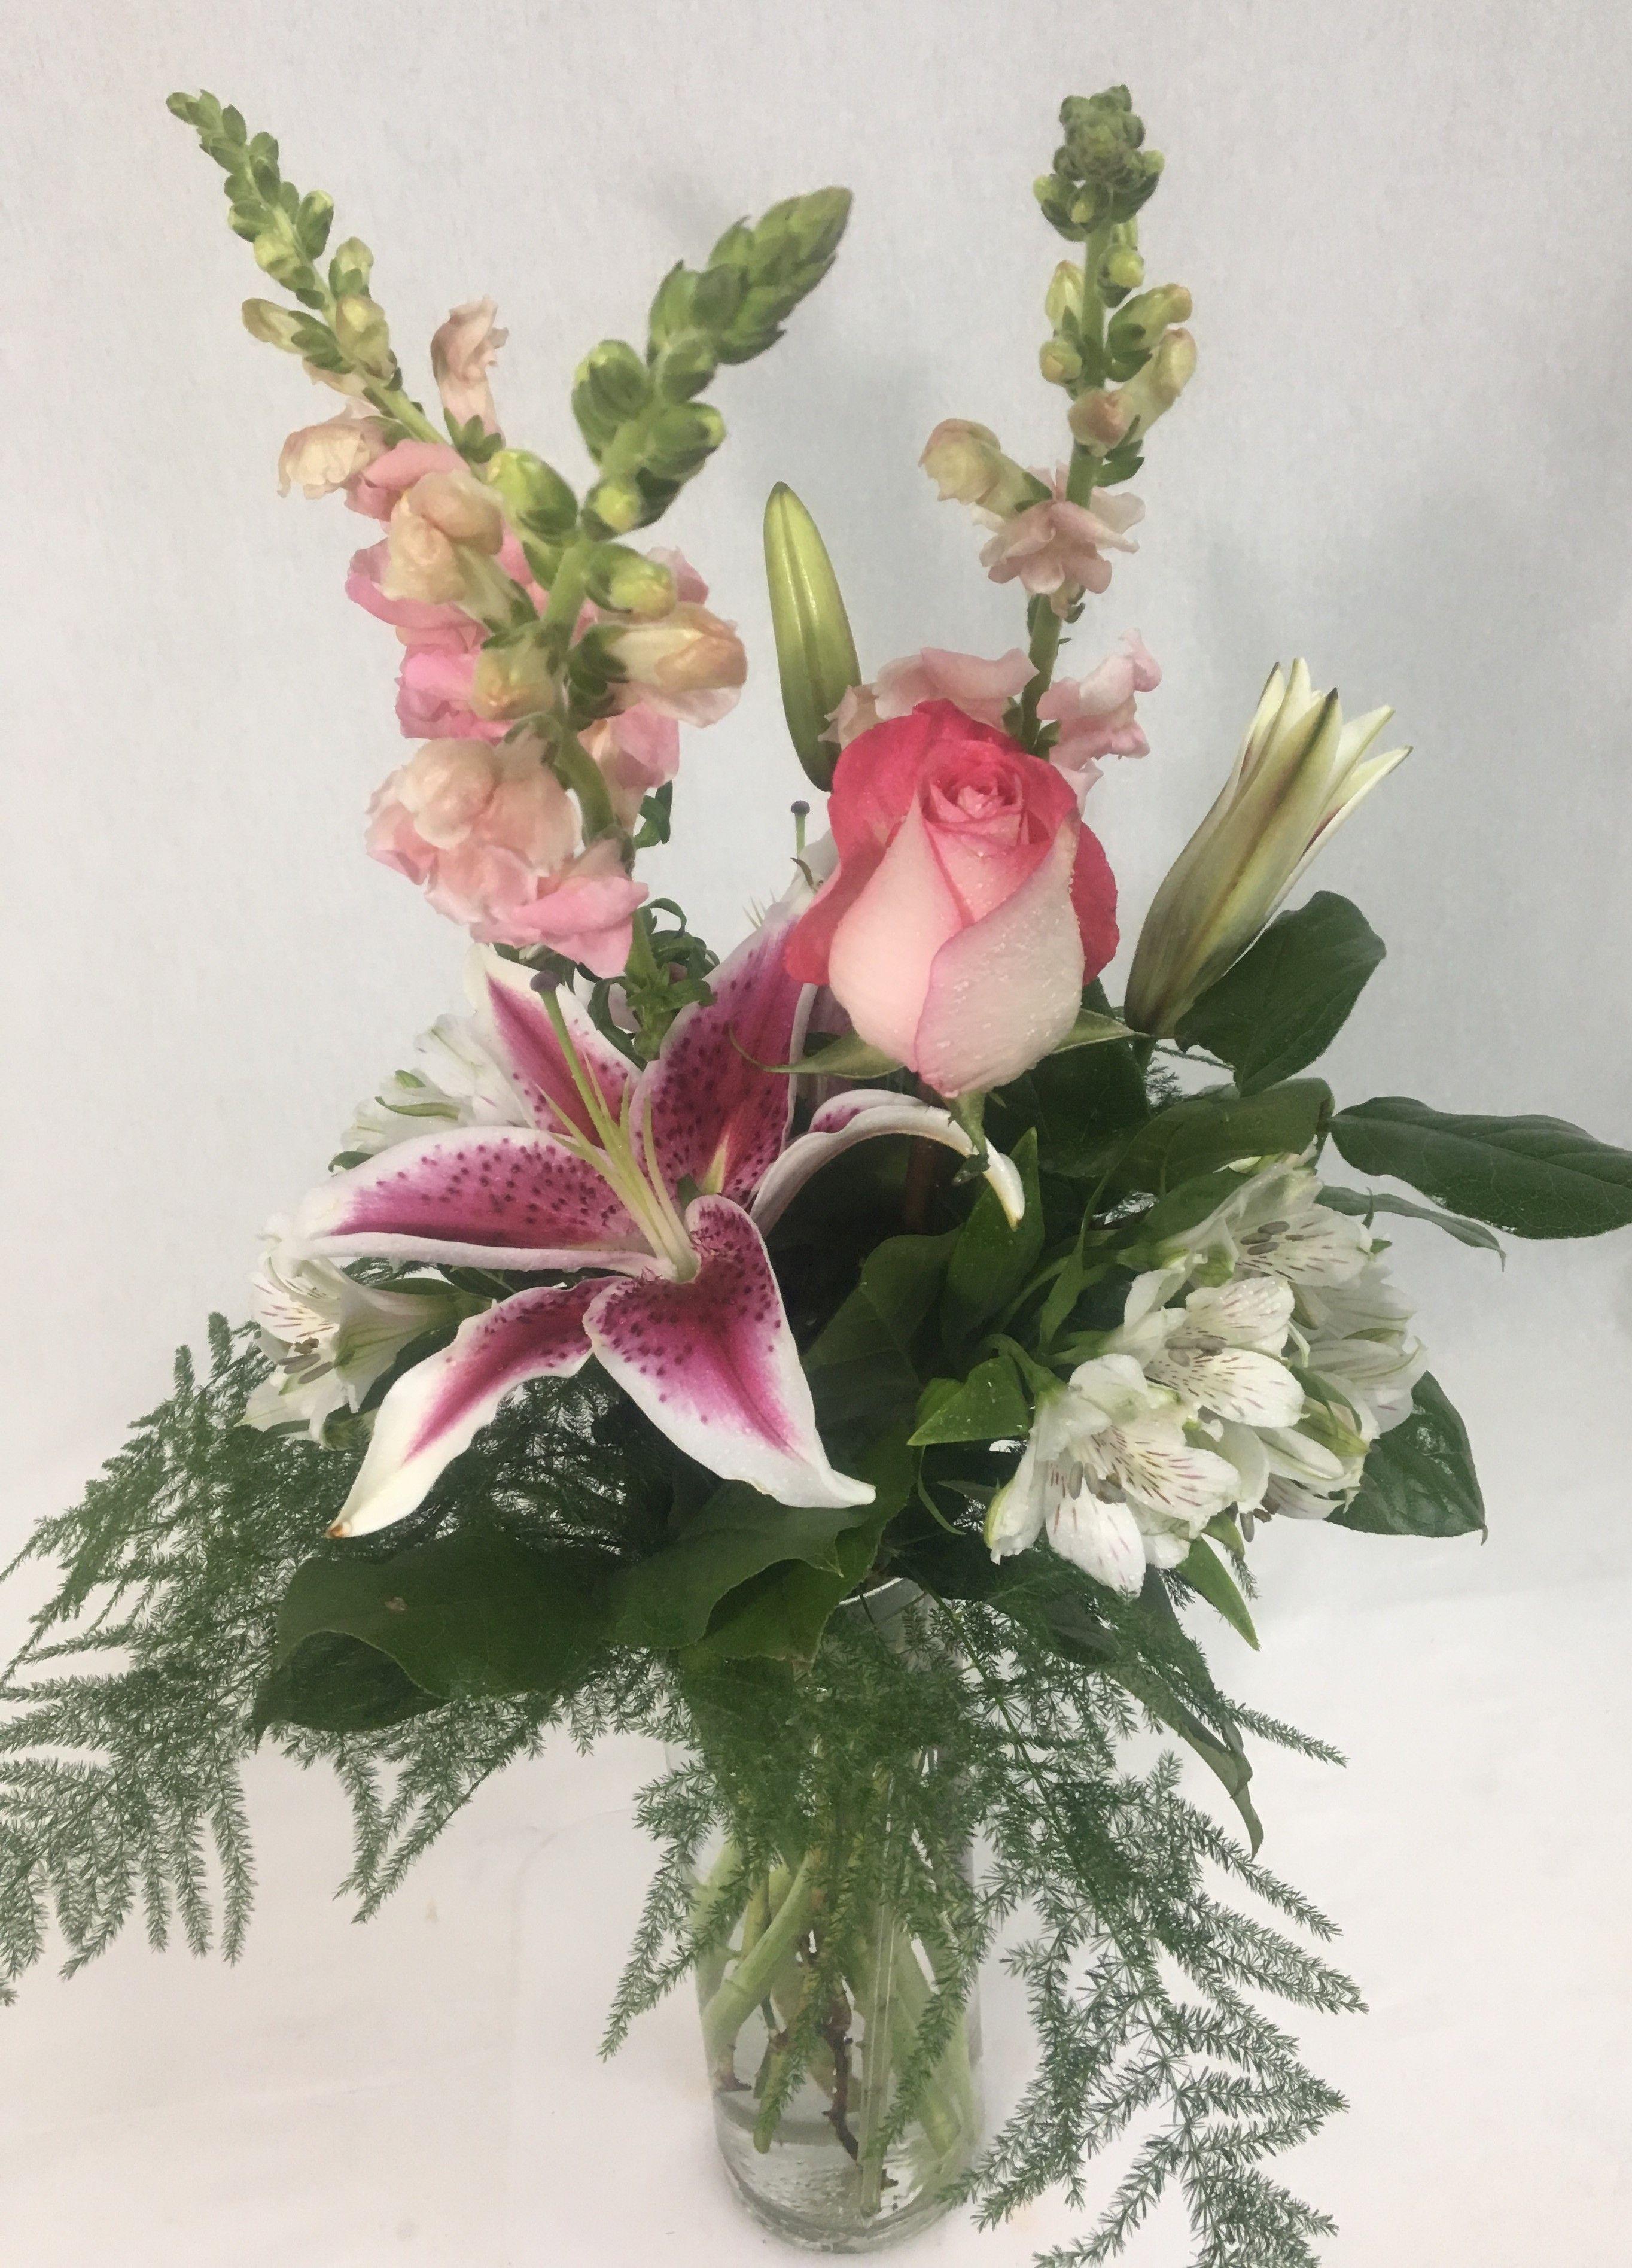 Pink Snapdragons Stargazer Lilies White Alstroemeria White With